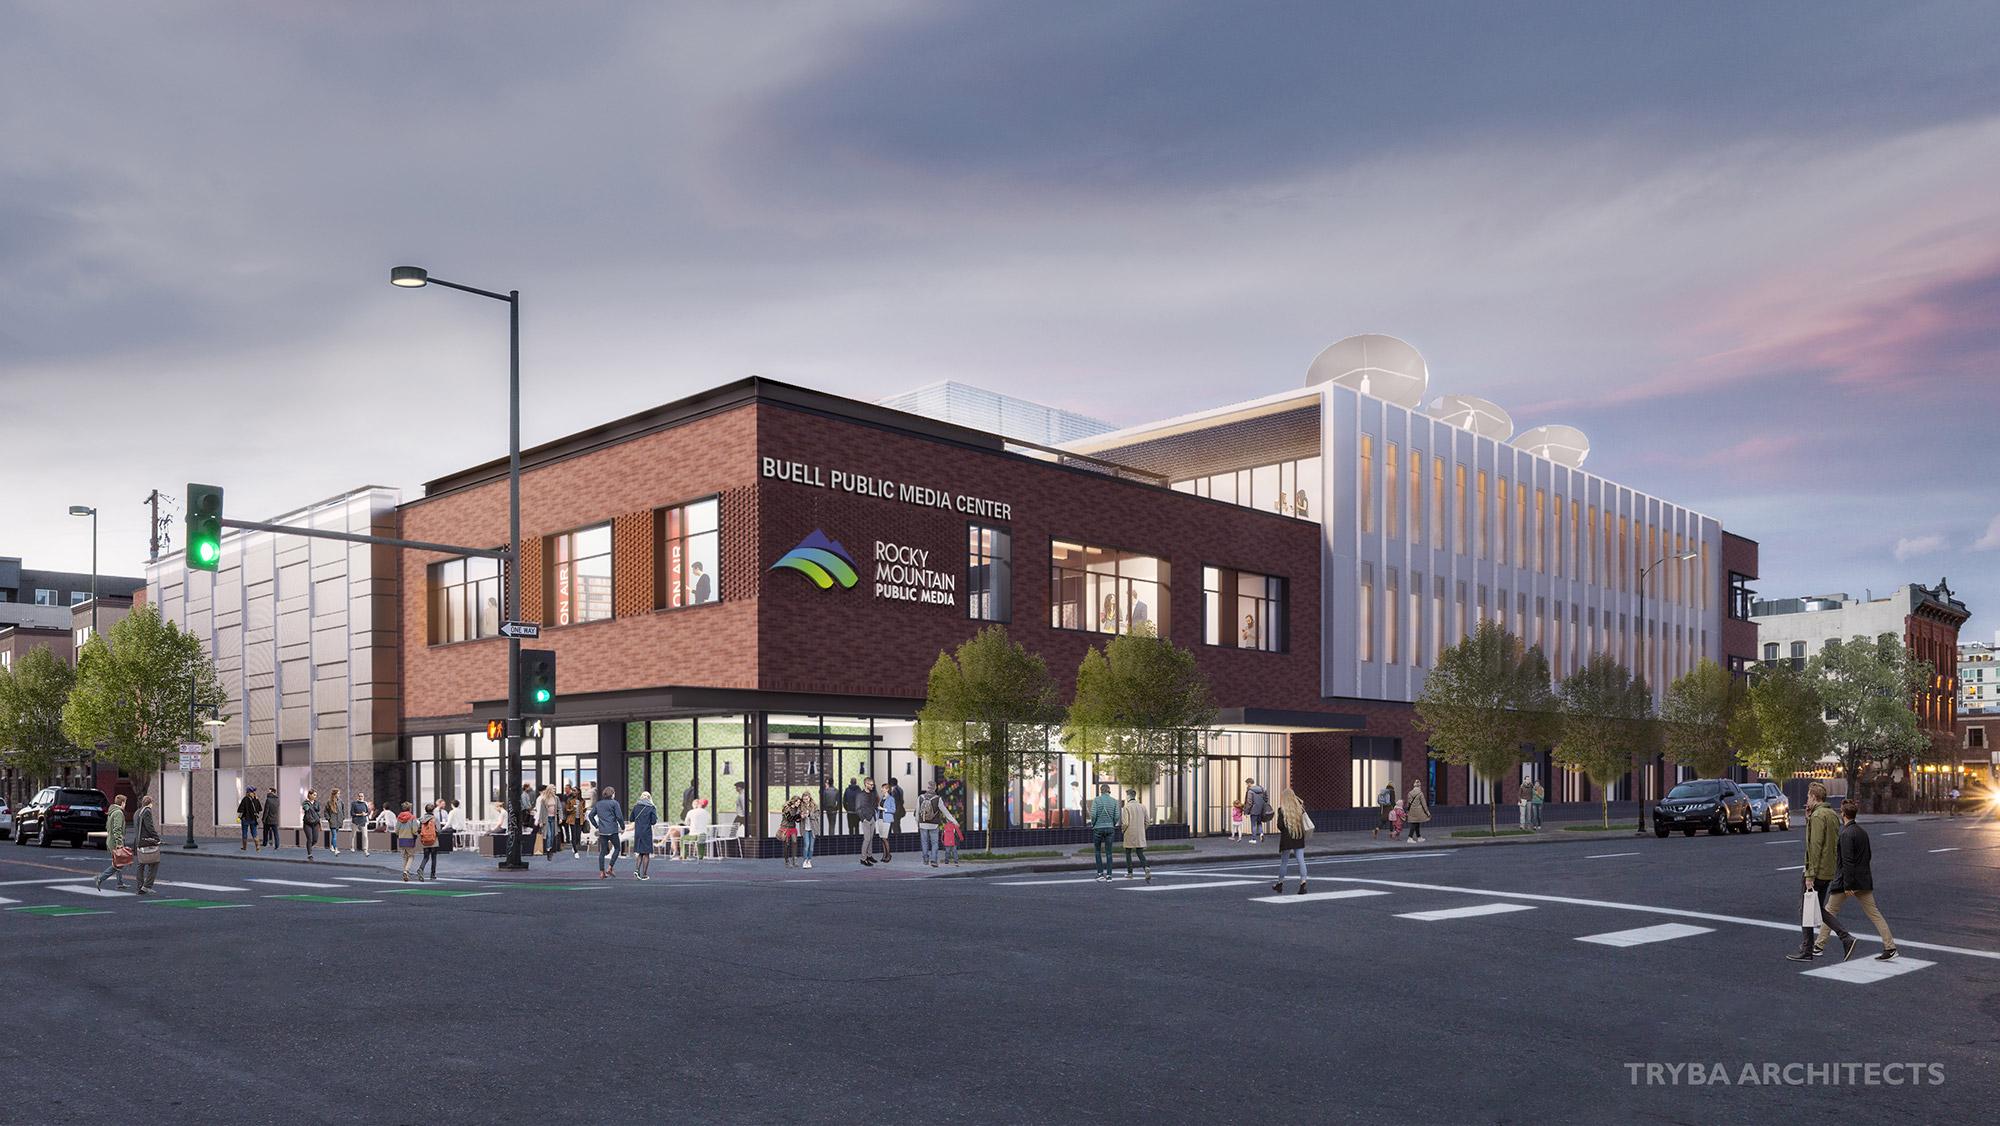 Buell Public Media Center rendering, courtesy Tryba Architects